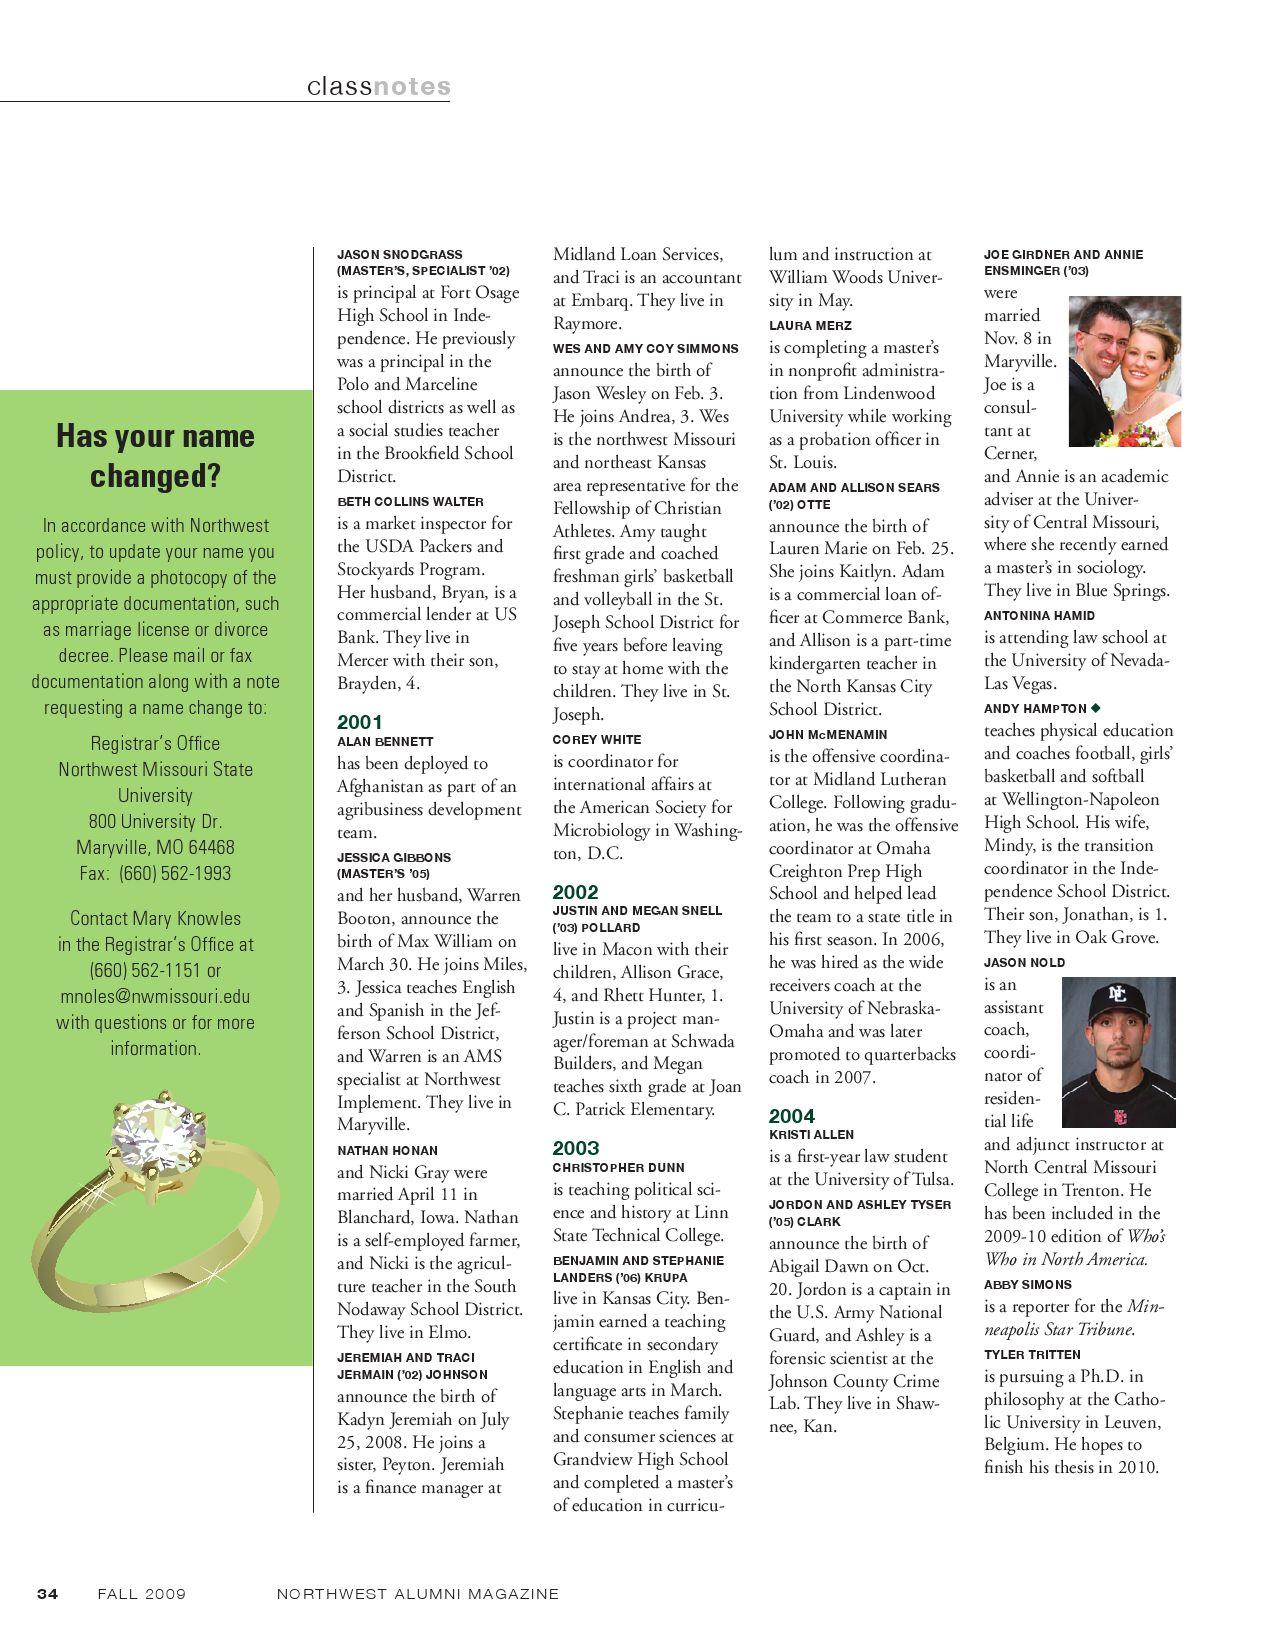 Northwest Missouri State University Alumni Magazine Fall 09 By